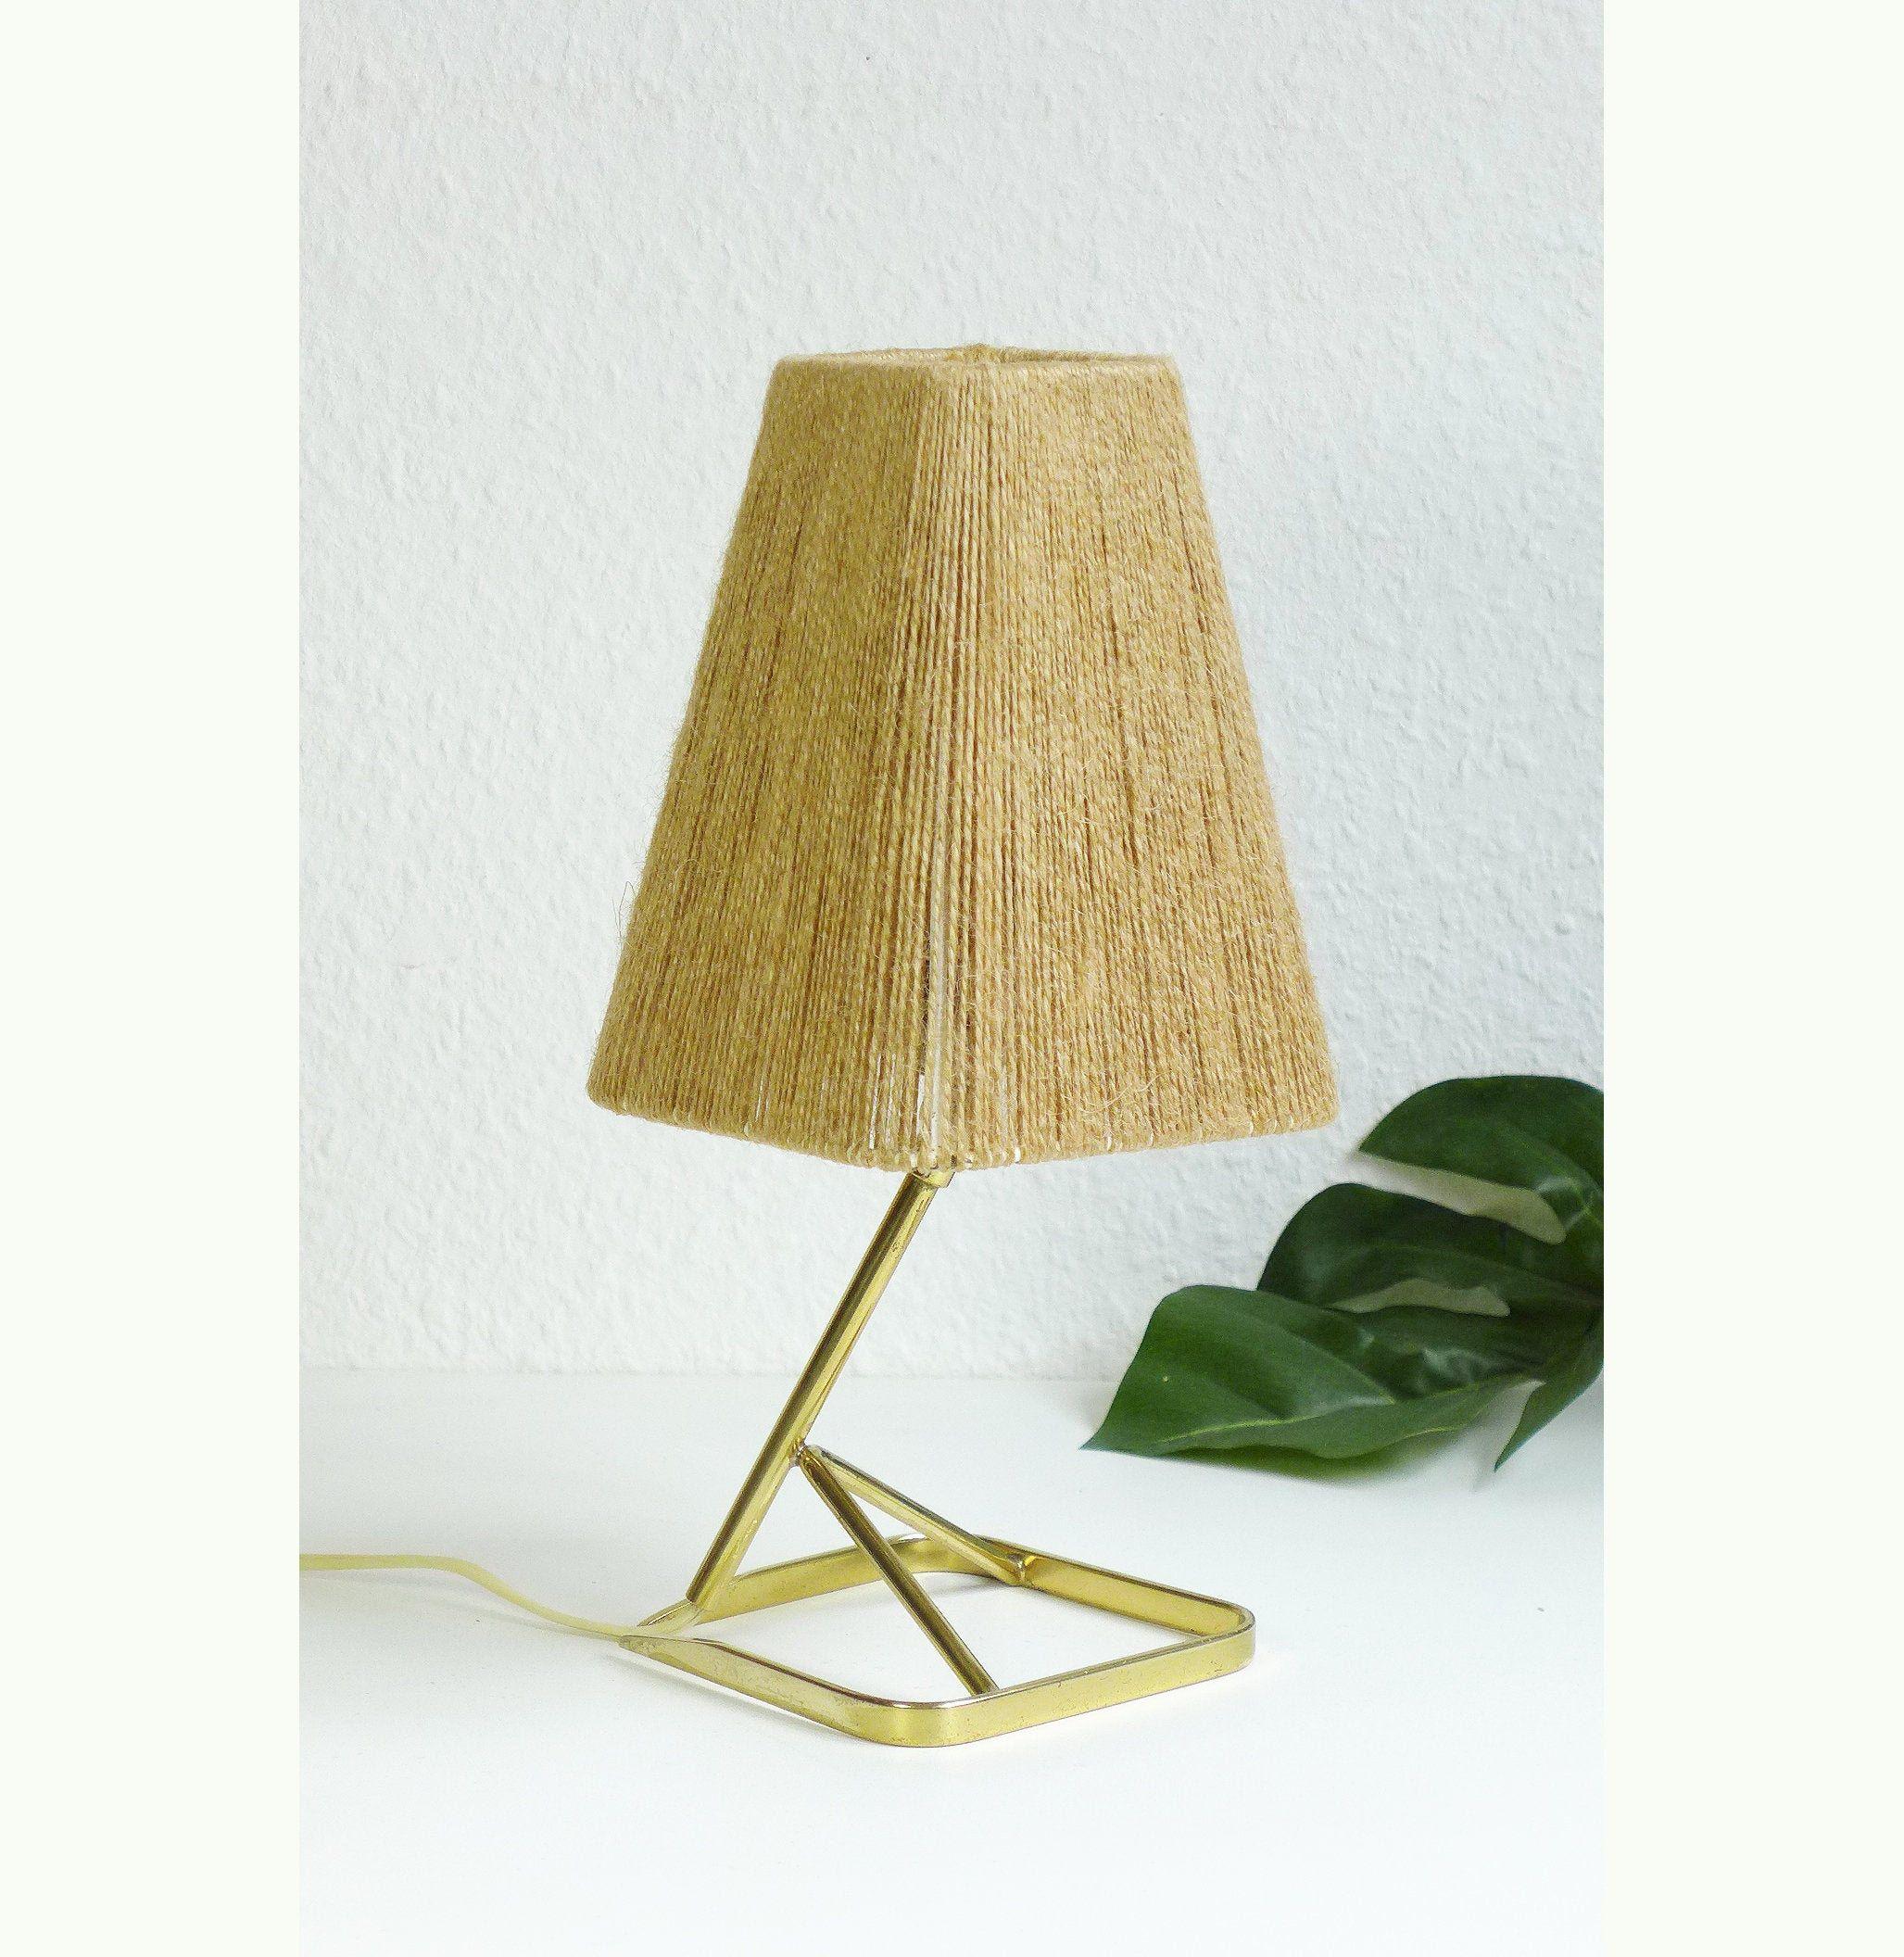 Rare Vintage Bedside Lamp Danish Design Table Light Sisal Night Light Mid Century Modern 1970s 1950s 1960s Scandinavian Table Lamp In 2020 Vintage Bedside Bedside Lamp Scandinavian Table Lamps